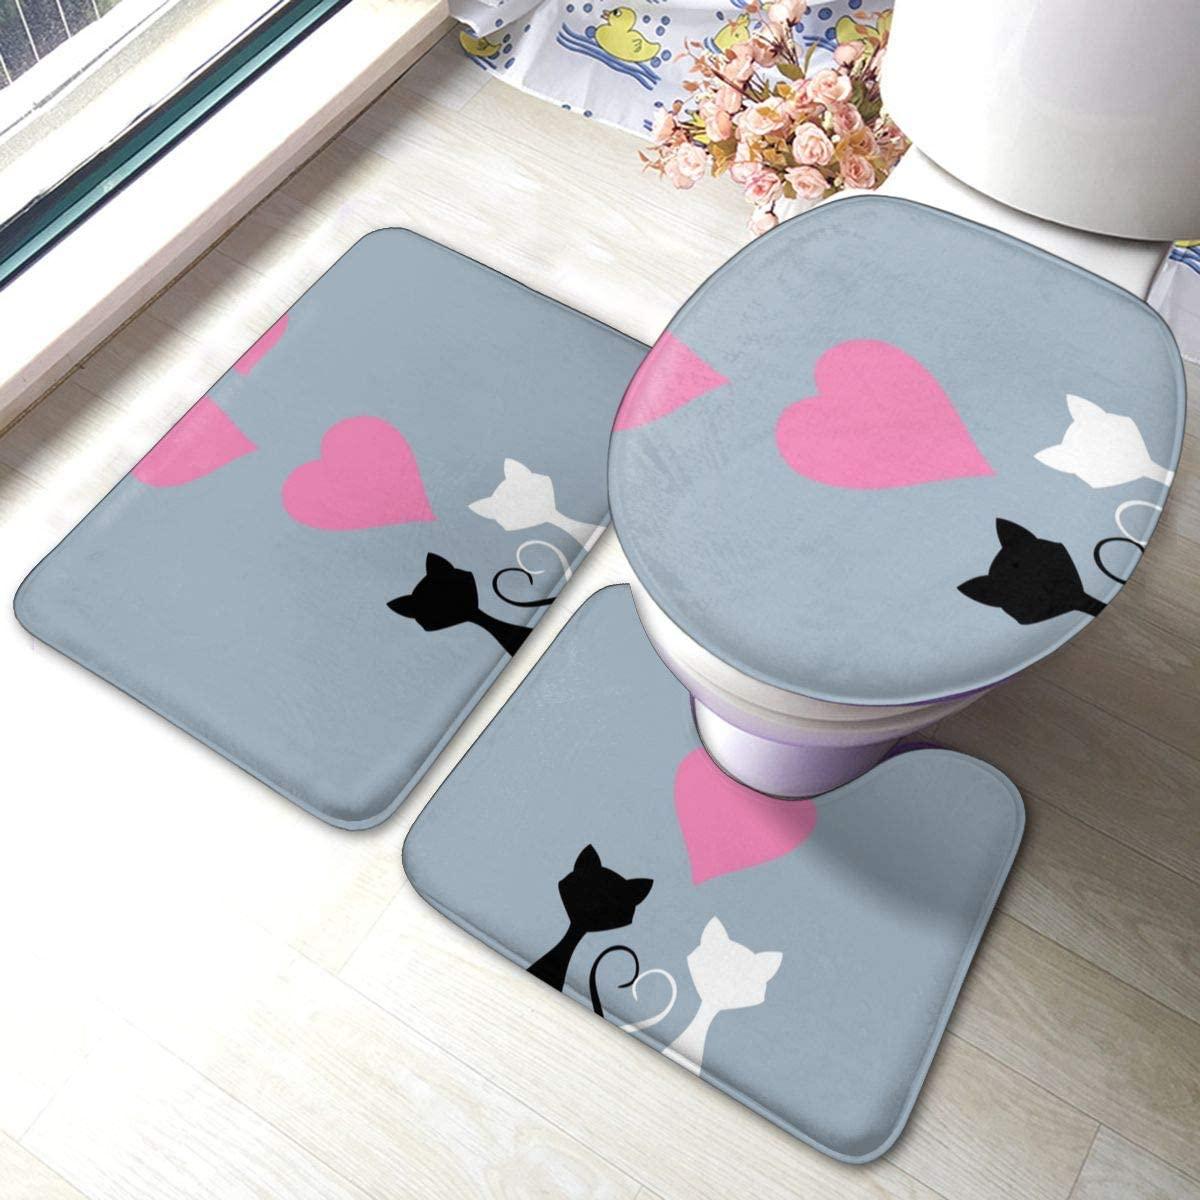 Bathroom Rugs Sets 3pc Cute Cartoon Cats Love Pink Hearts Non Slip Bath Mats Rug U Shaped Contour Rug Toilet Lid Cover Mat Washable Floor Carpet Shower Tub Bathroom Accessories Decor